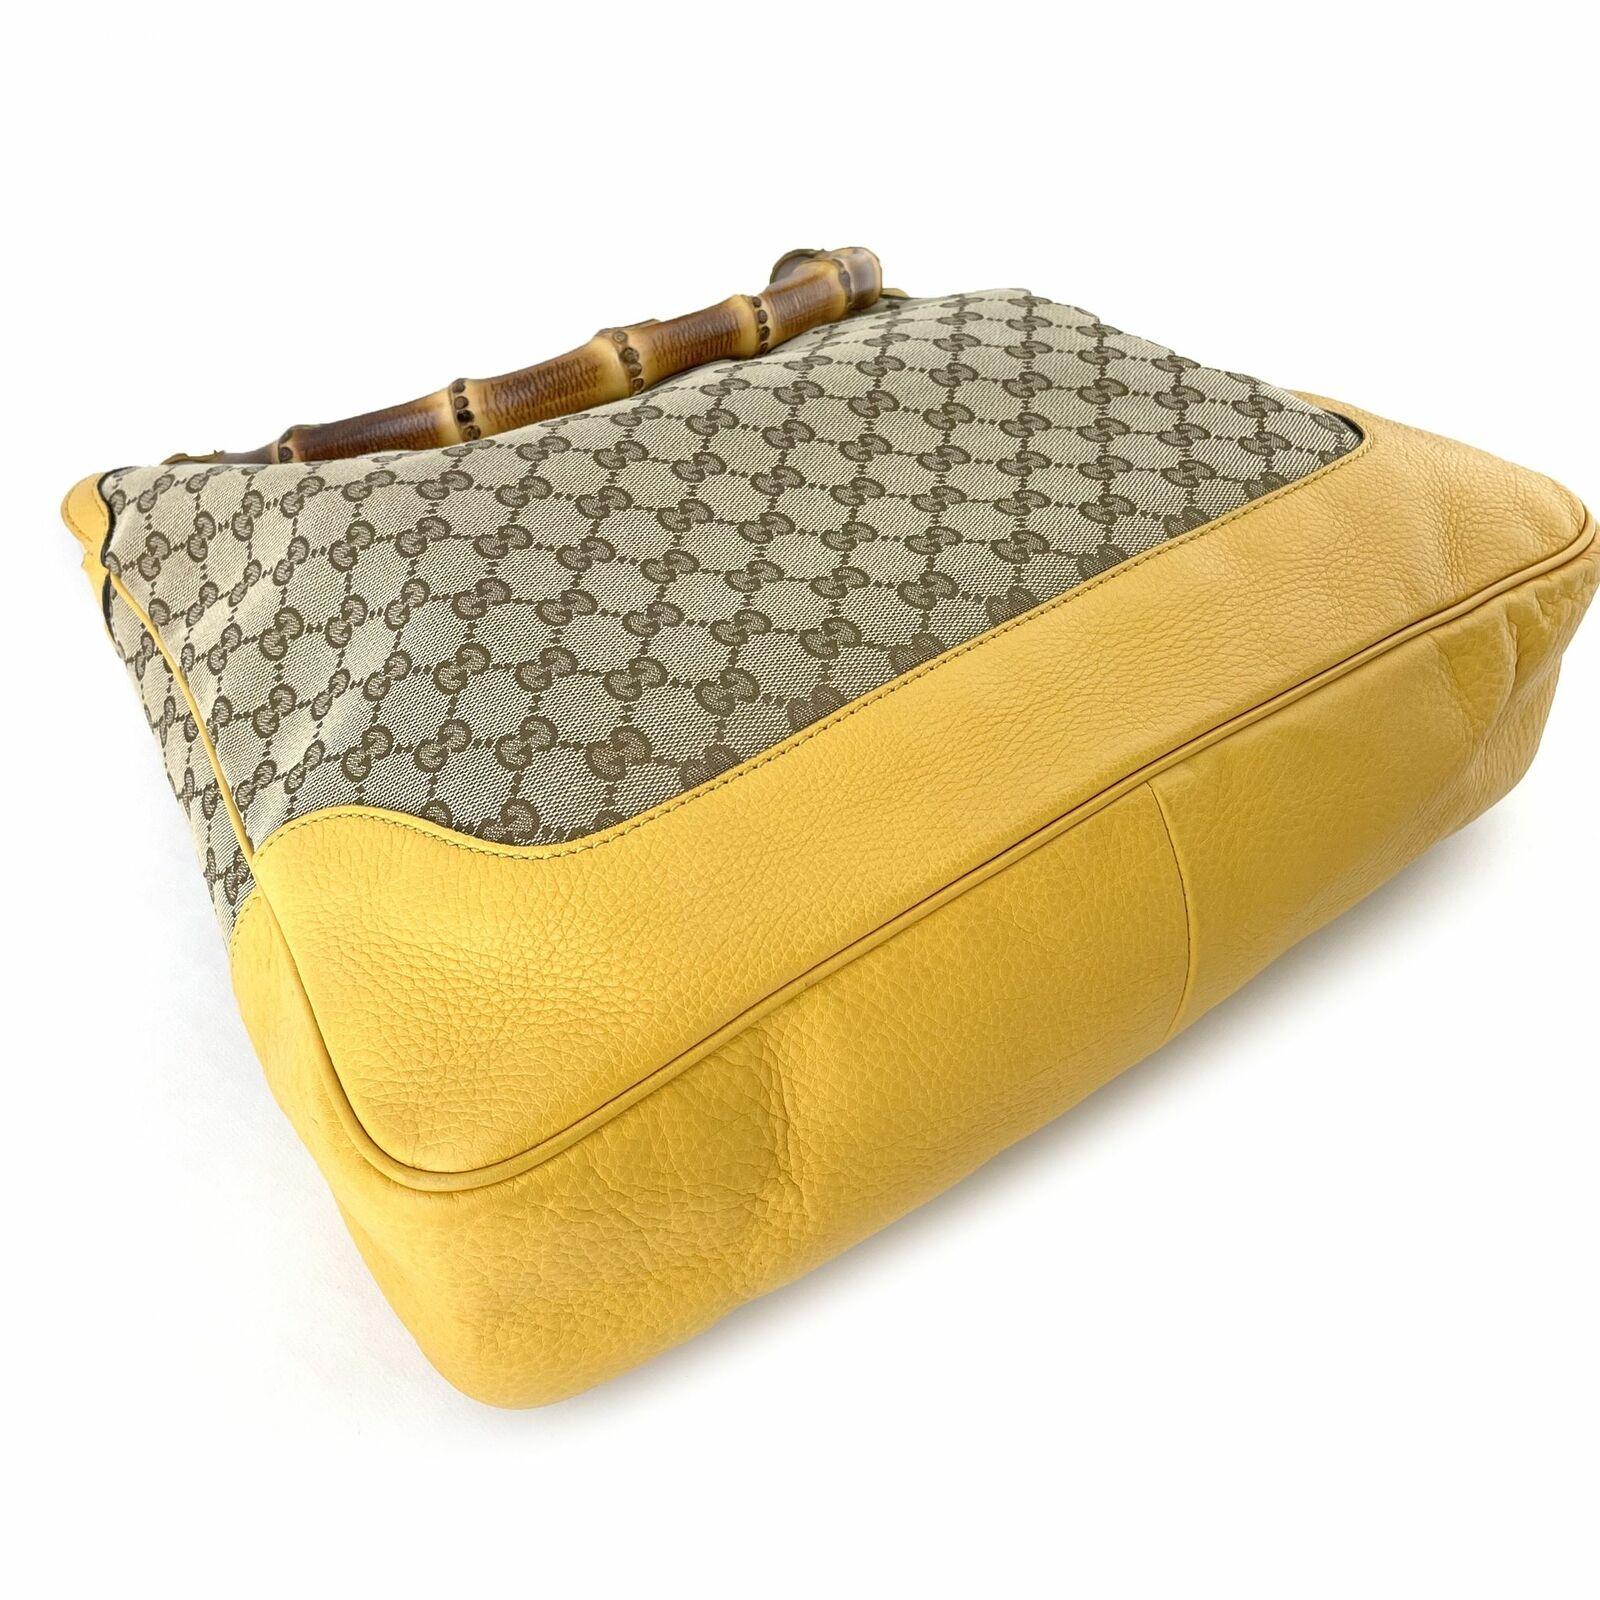 Gucci GG Canvas Diana Bamboo Shoulder Bag - Beige… - image 6